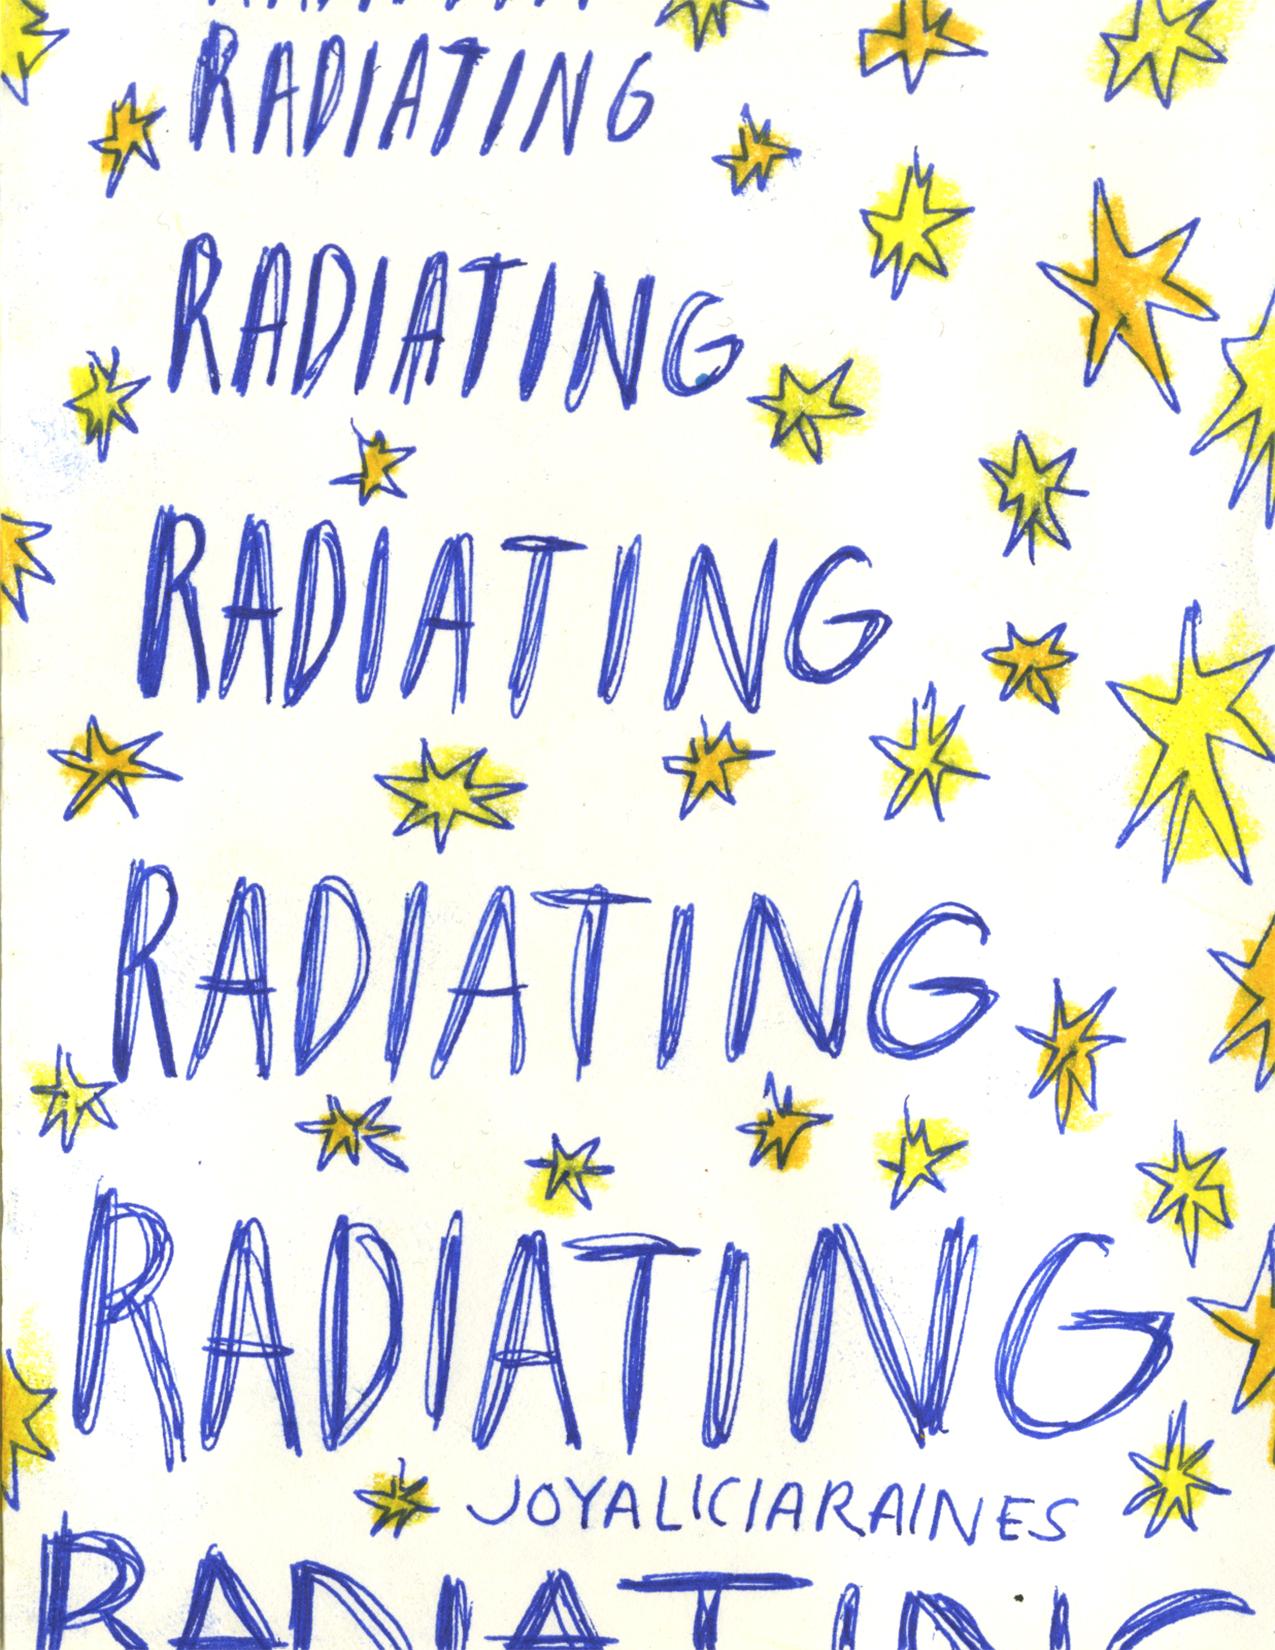 Radiating - Page 1